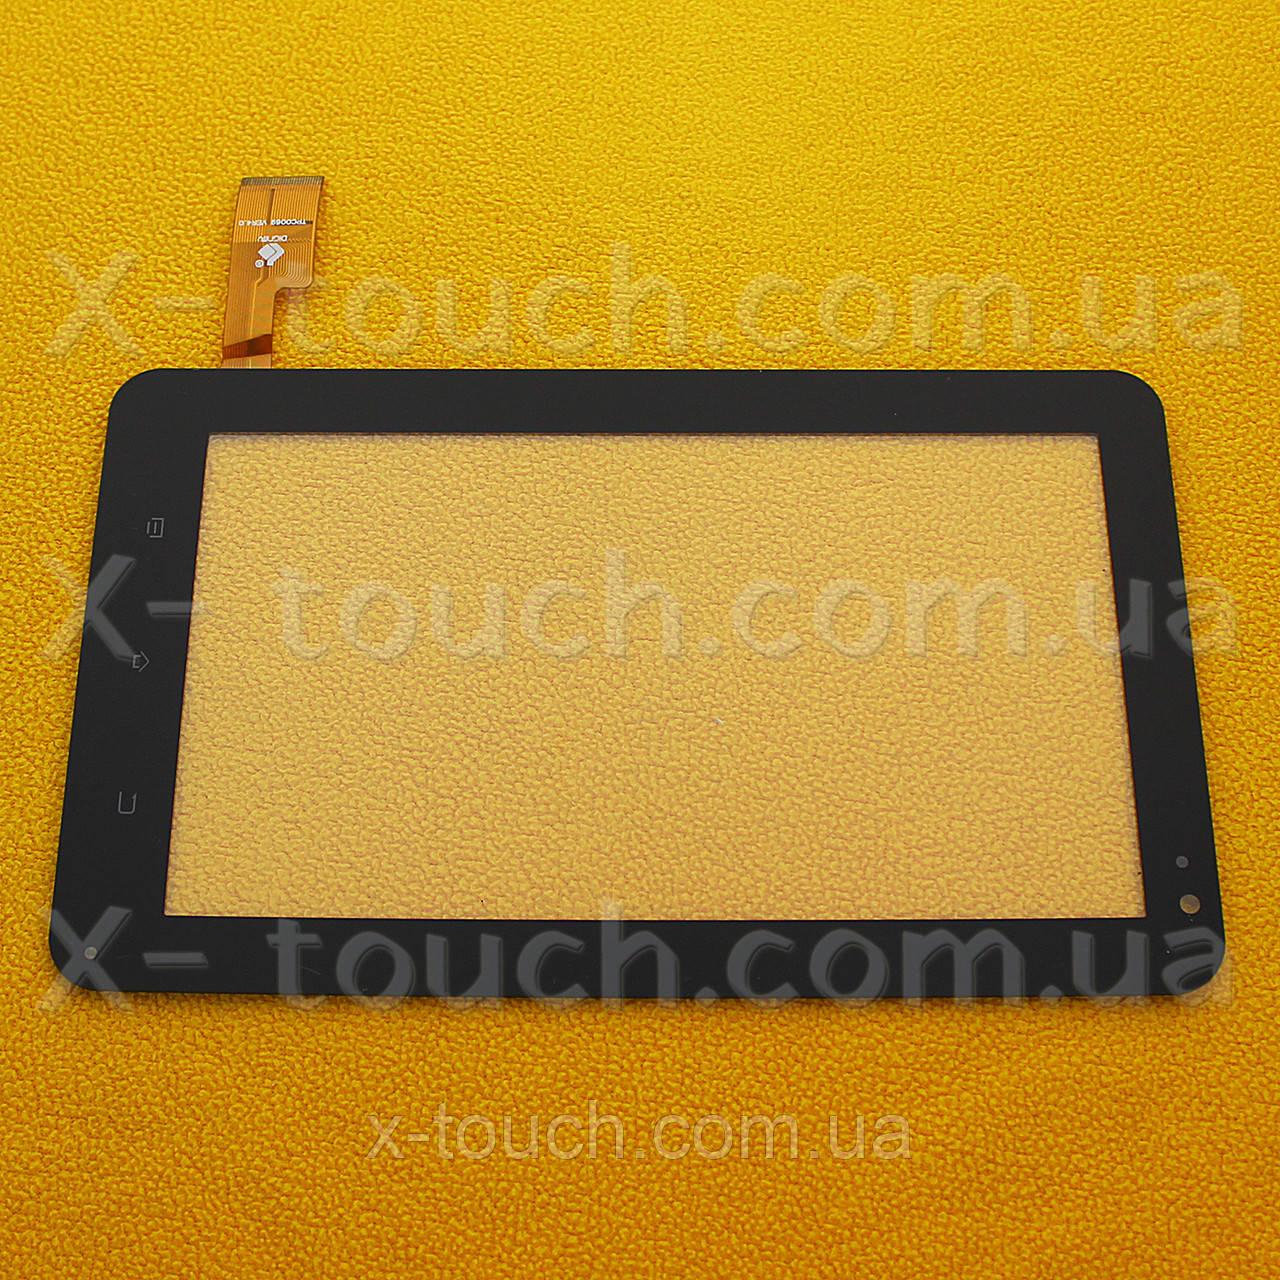 Тачскрин, сенсор  TPC0069 VER4.0 для планшета